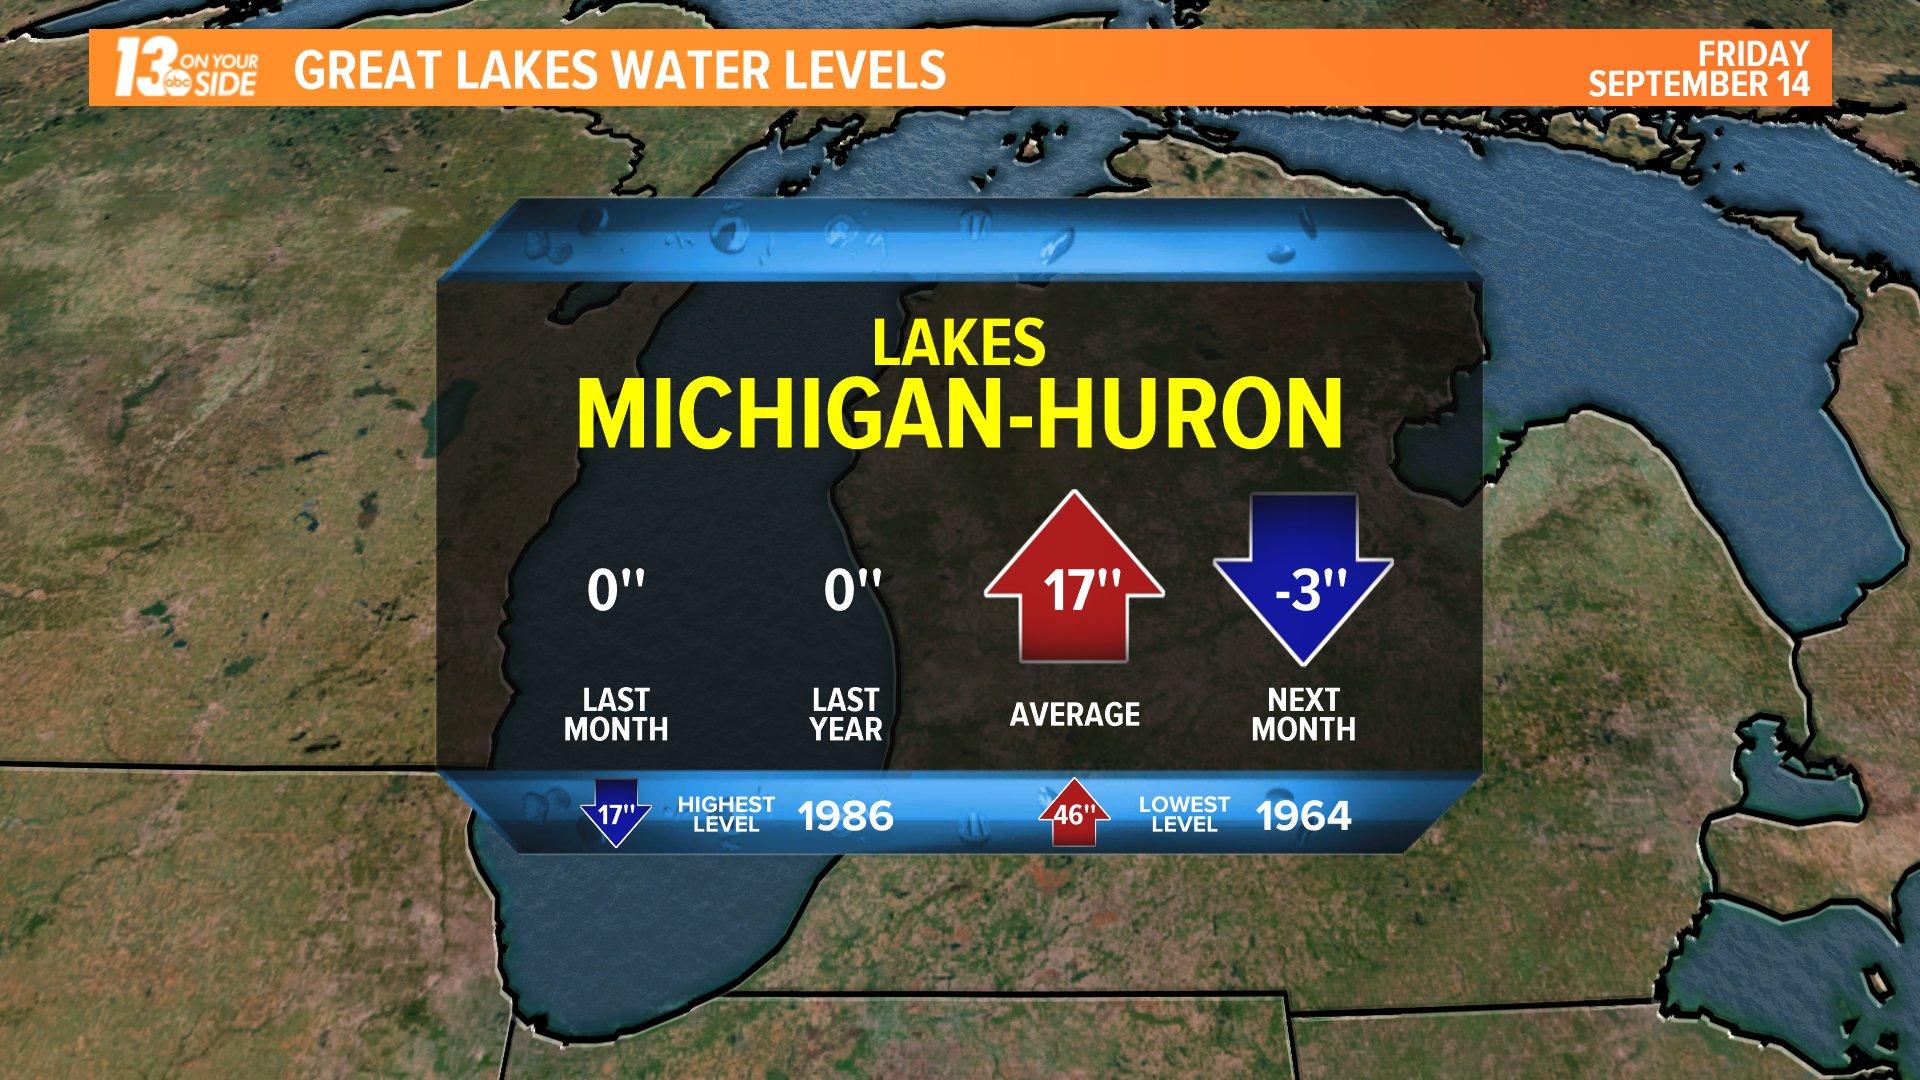 Weekly Lake Michigan Water Level